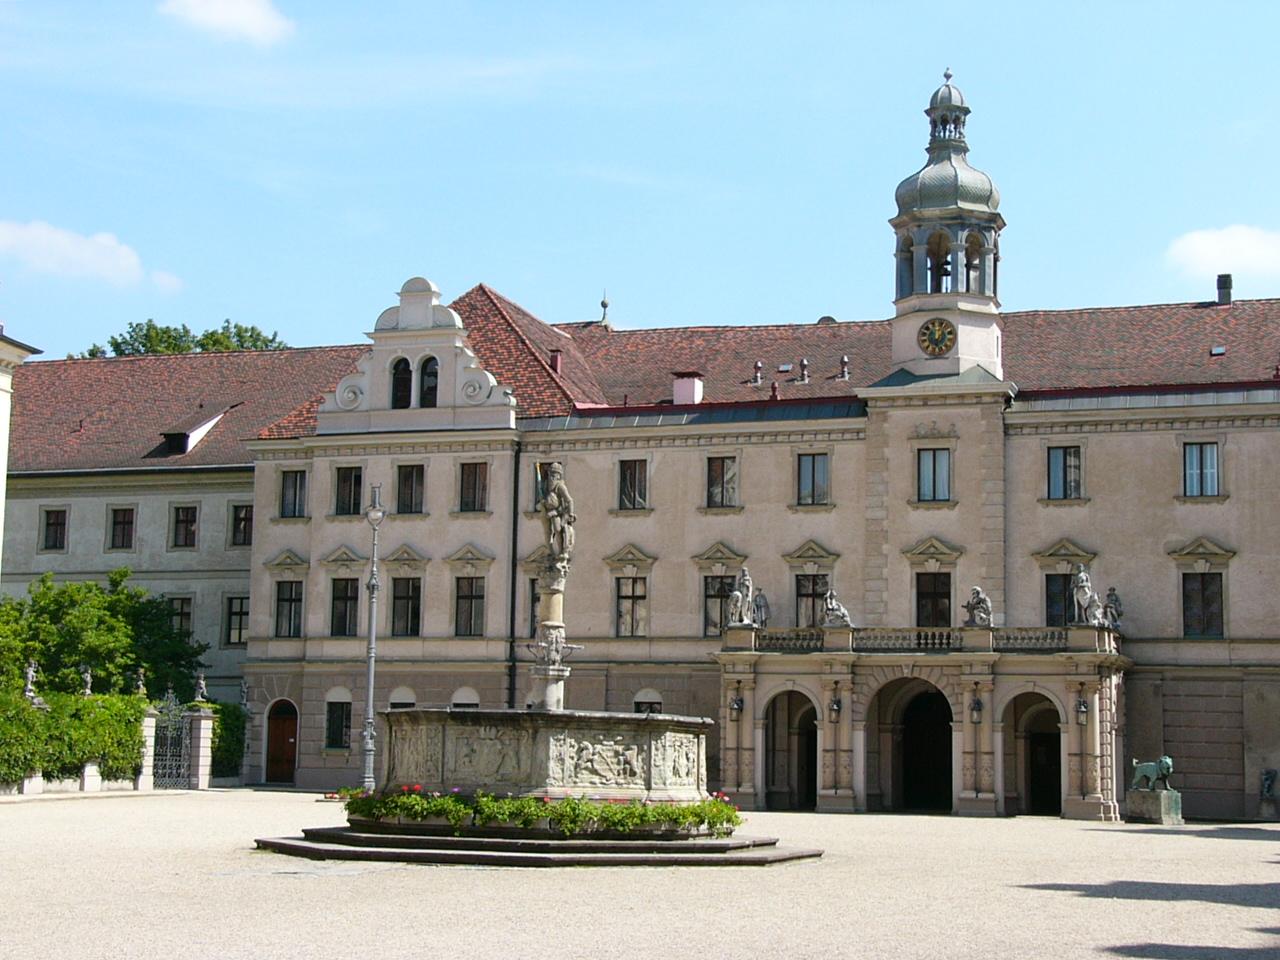 Bild Schloss St. Emmeram Regensburg